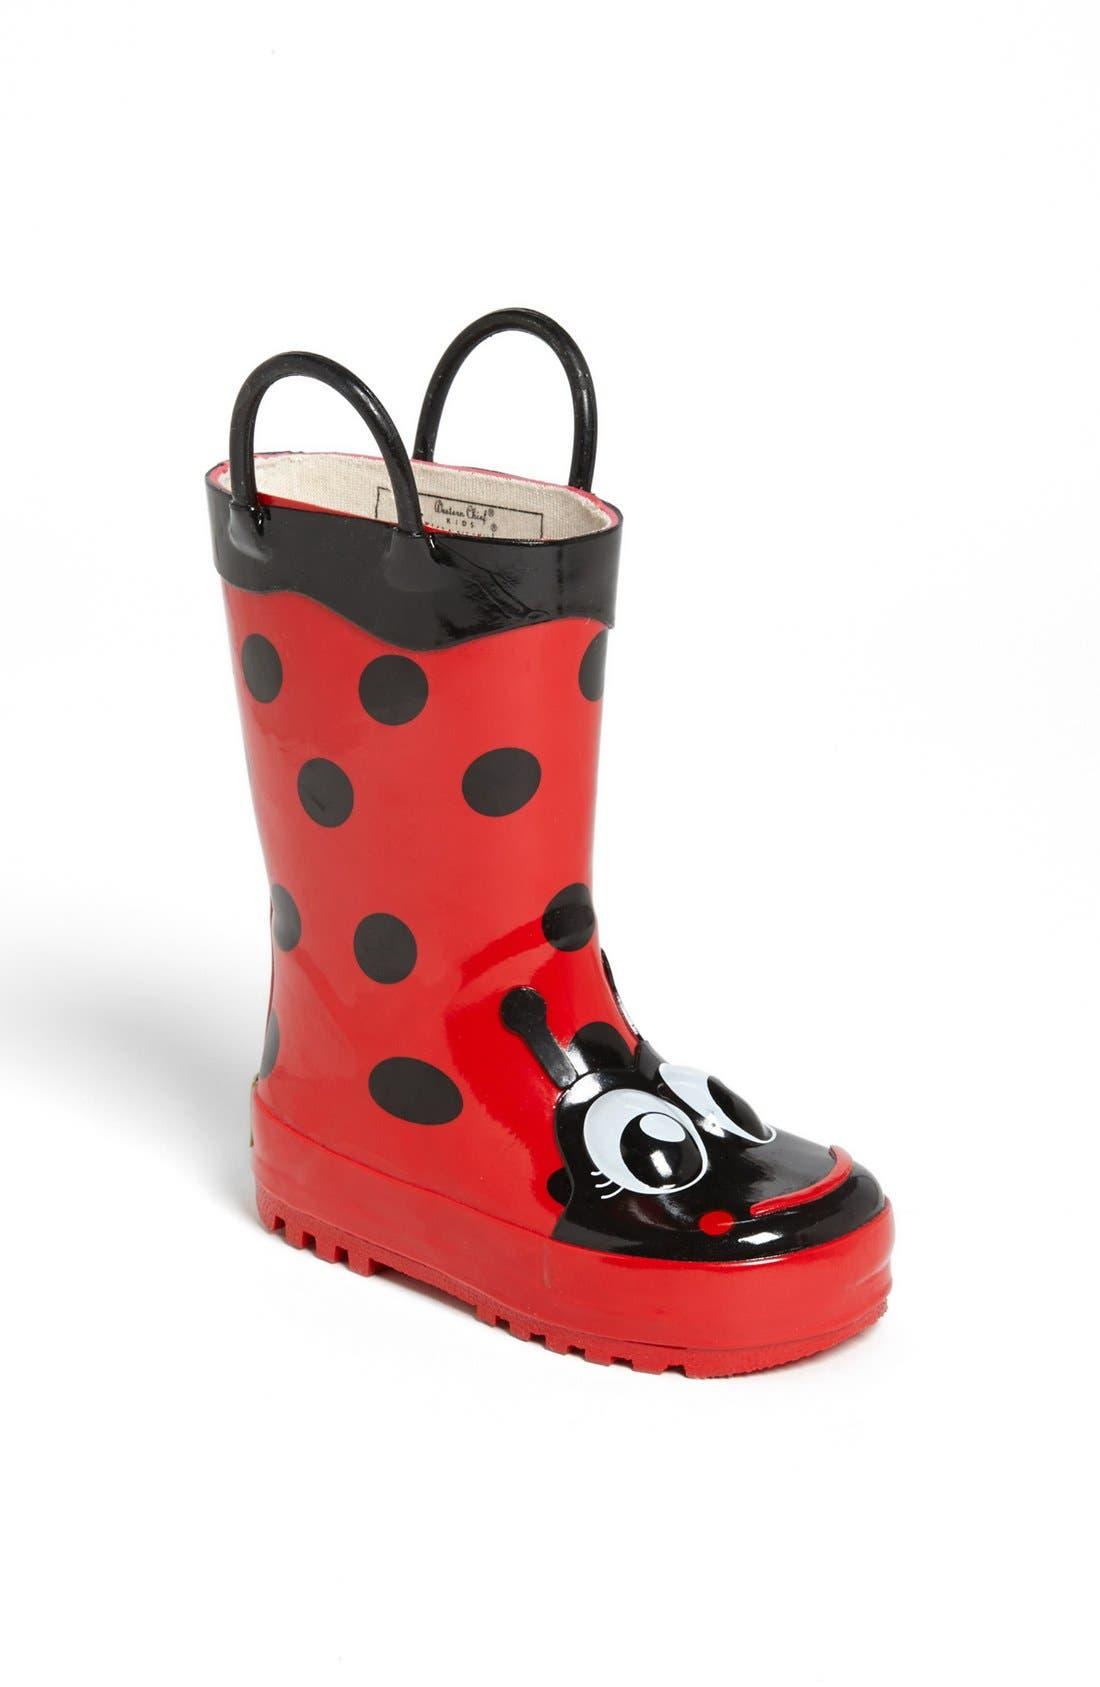 WESTERN CHIEF Ladybug Waterproof Rain Boot, Main, color, RED